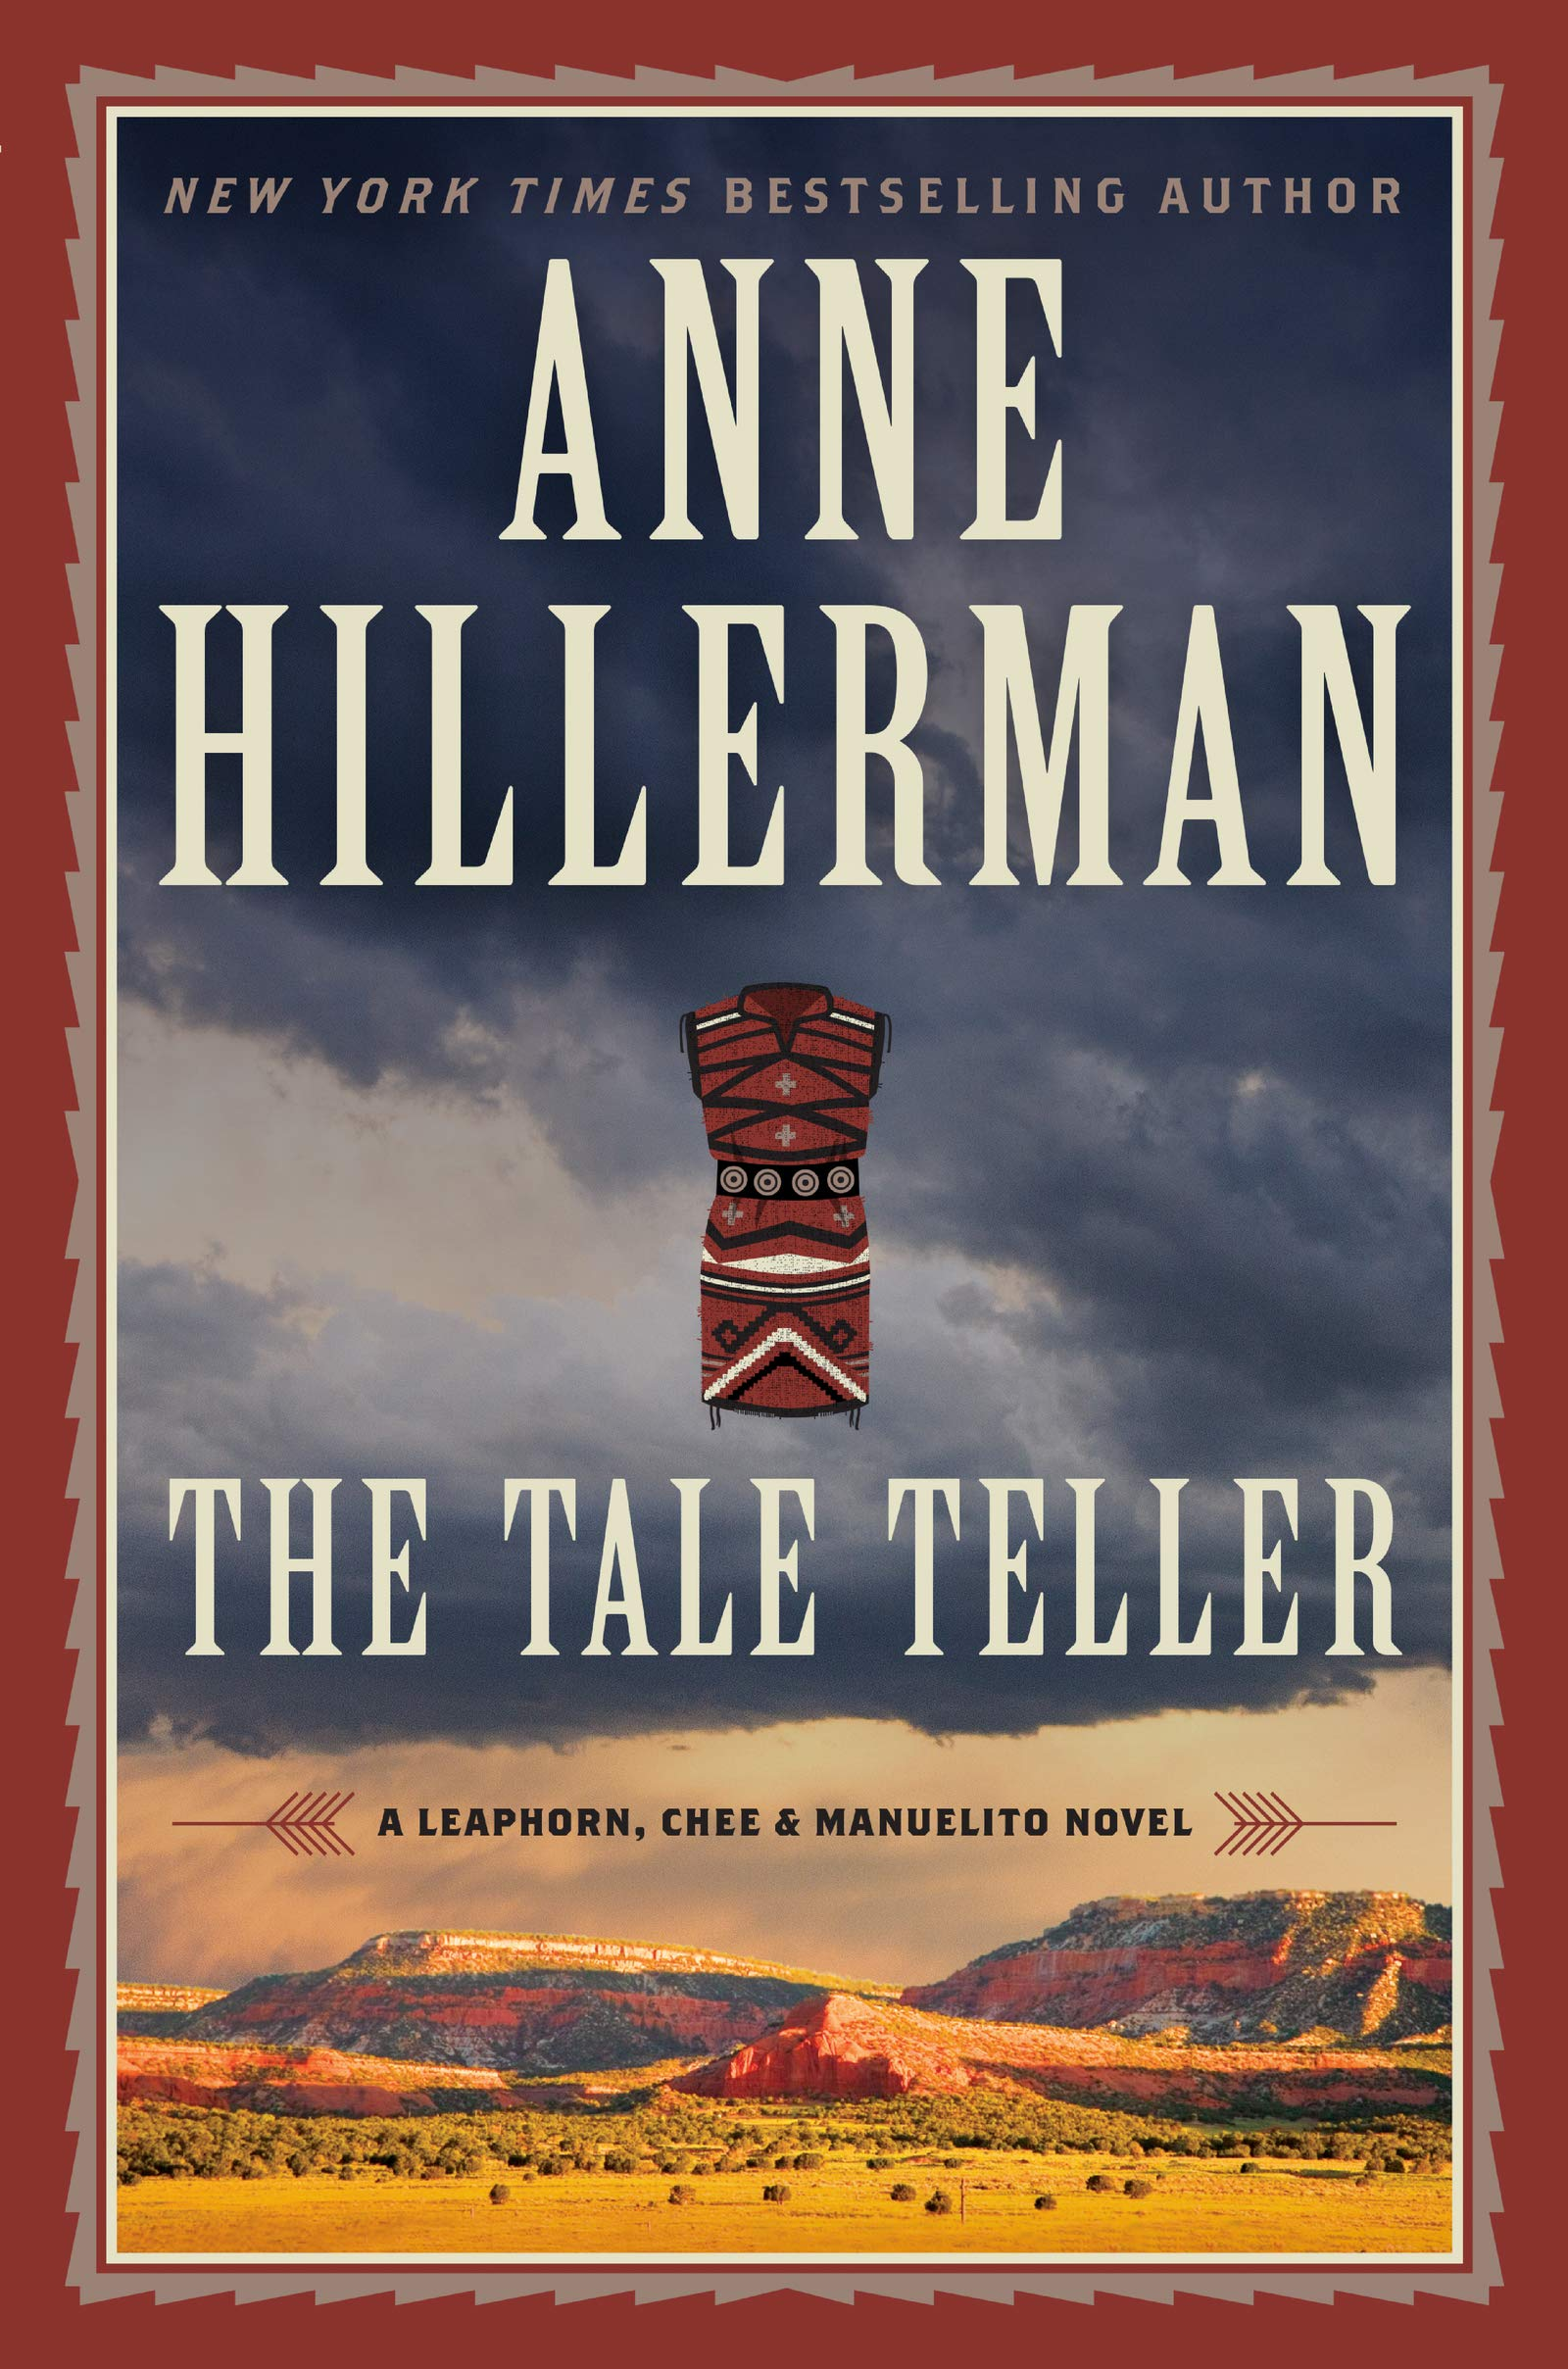 The Tale Teller: A Leaphorn, Chee & Manuelito Novel (A Leaphorn and Chee Novel Book 23)